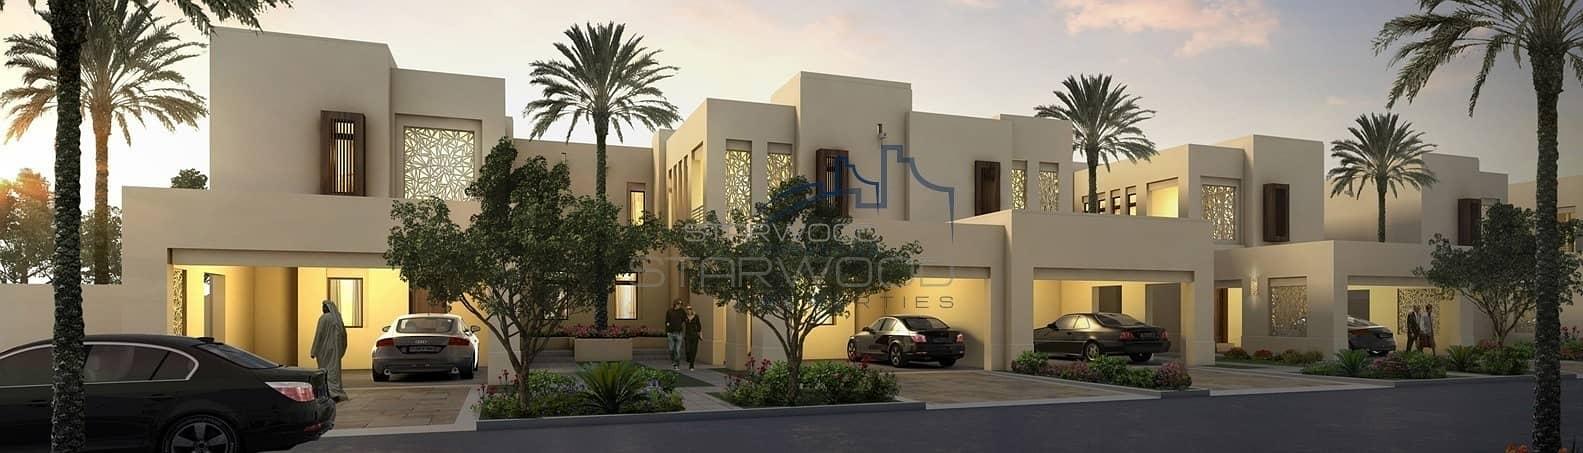 1Month Free 4BHK villa in Mira Oasis @ 100k